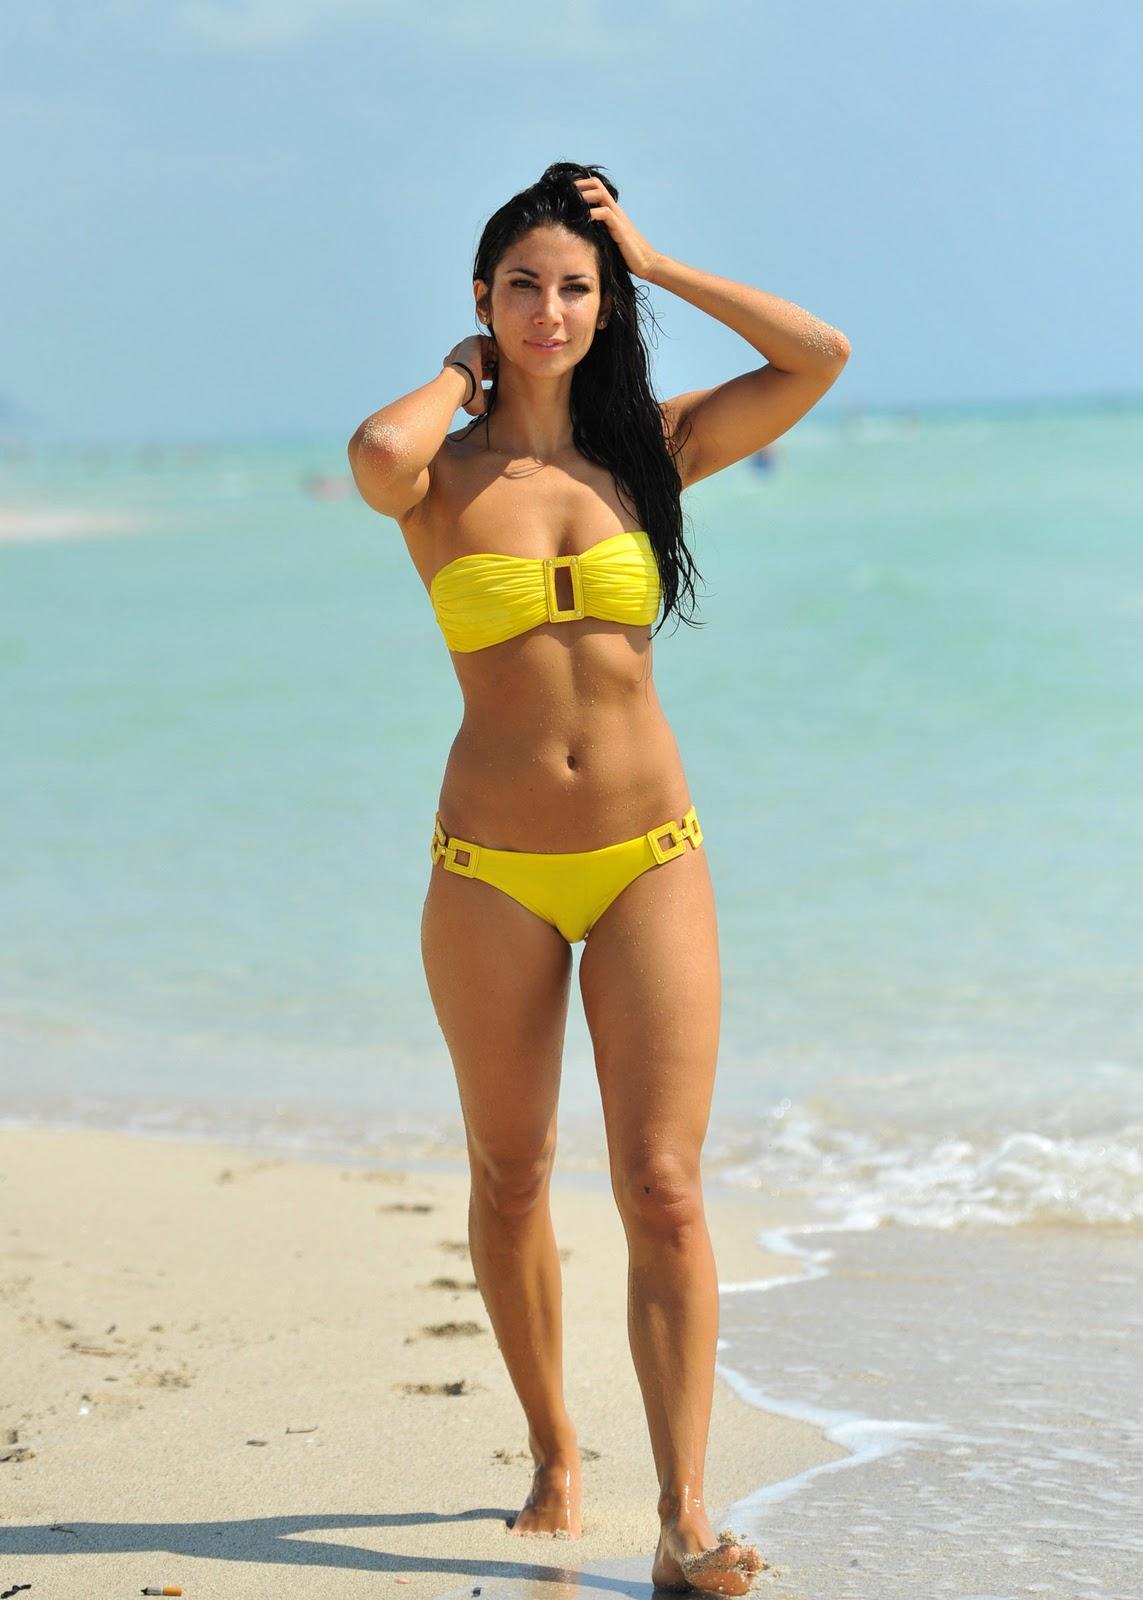 http://2.bp.blogspot.com/-A07iiInRa-U/To3l-t3Rt5I/AAAAAAAAGDk/cQUF8aY73yo/s1600/Leilani+Dowding+4.jpg